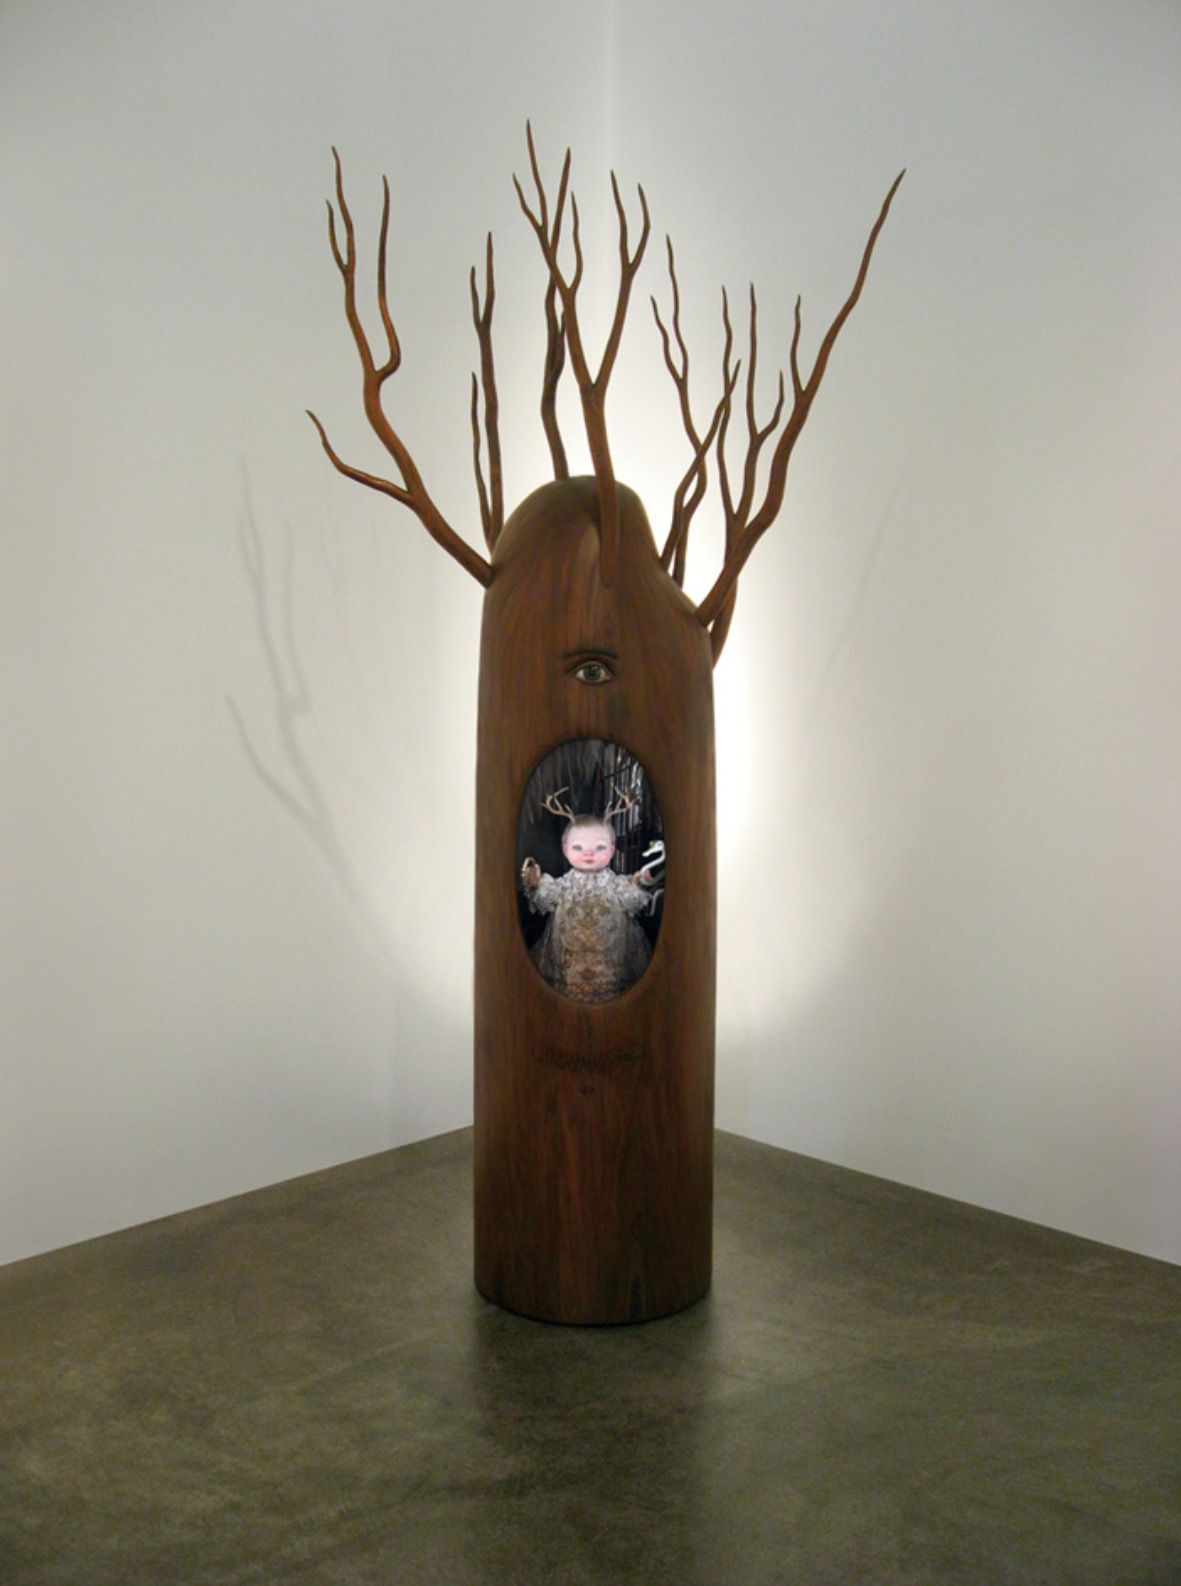 Mark ryden the tree show cernunnos 672006